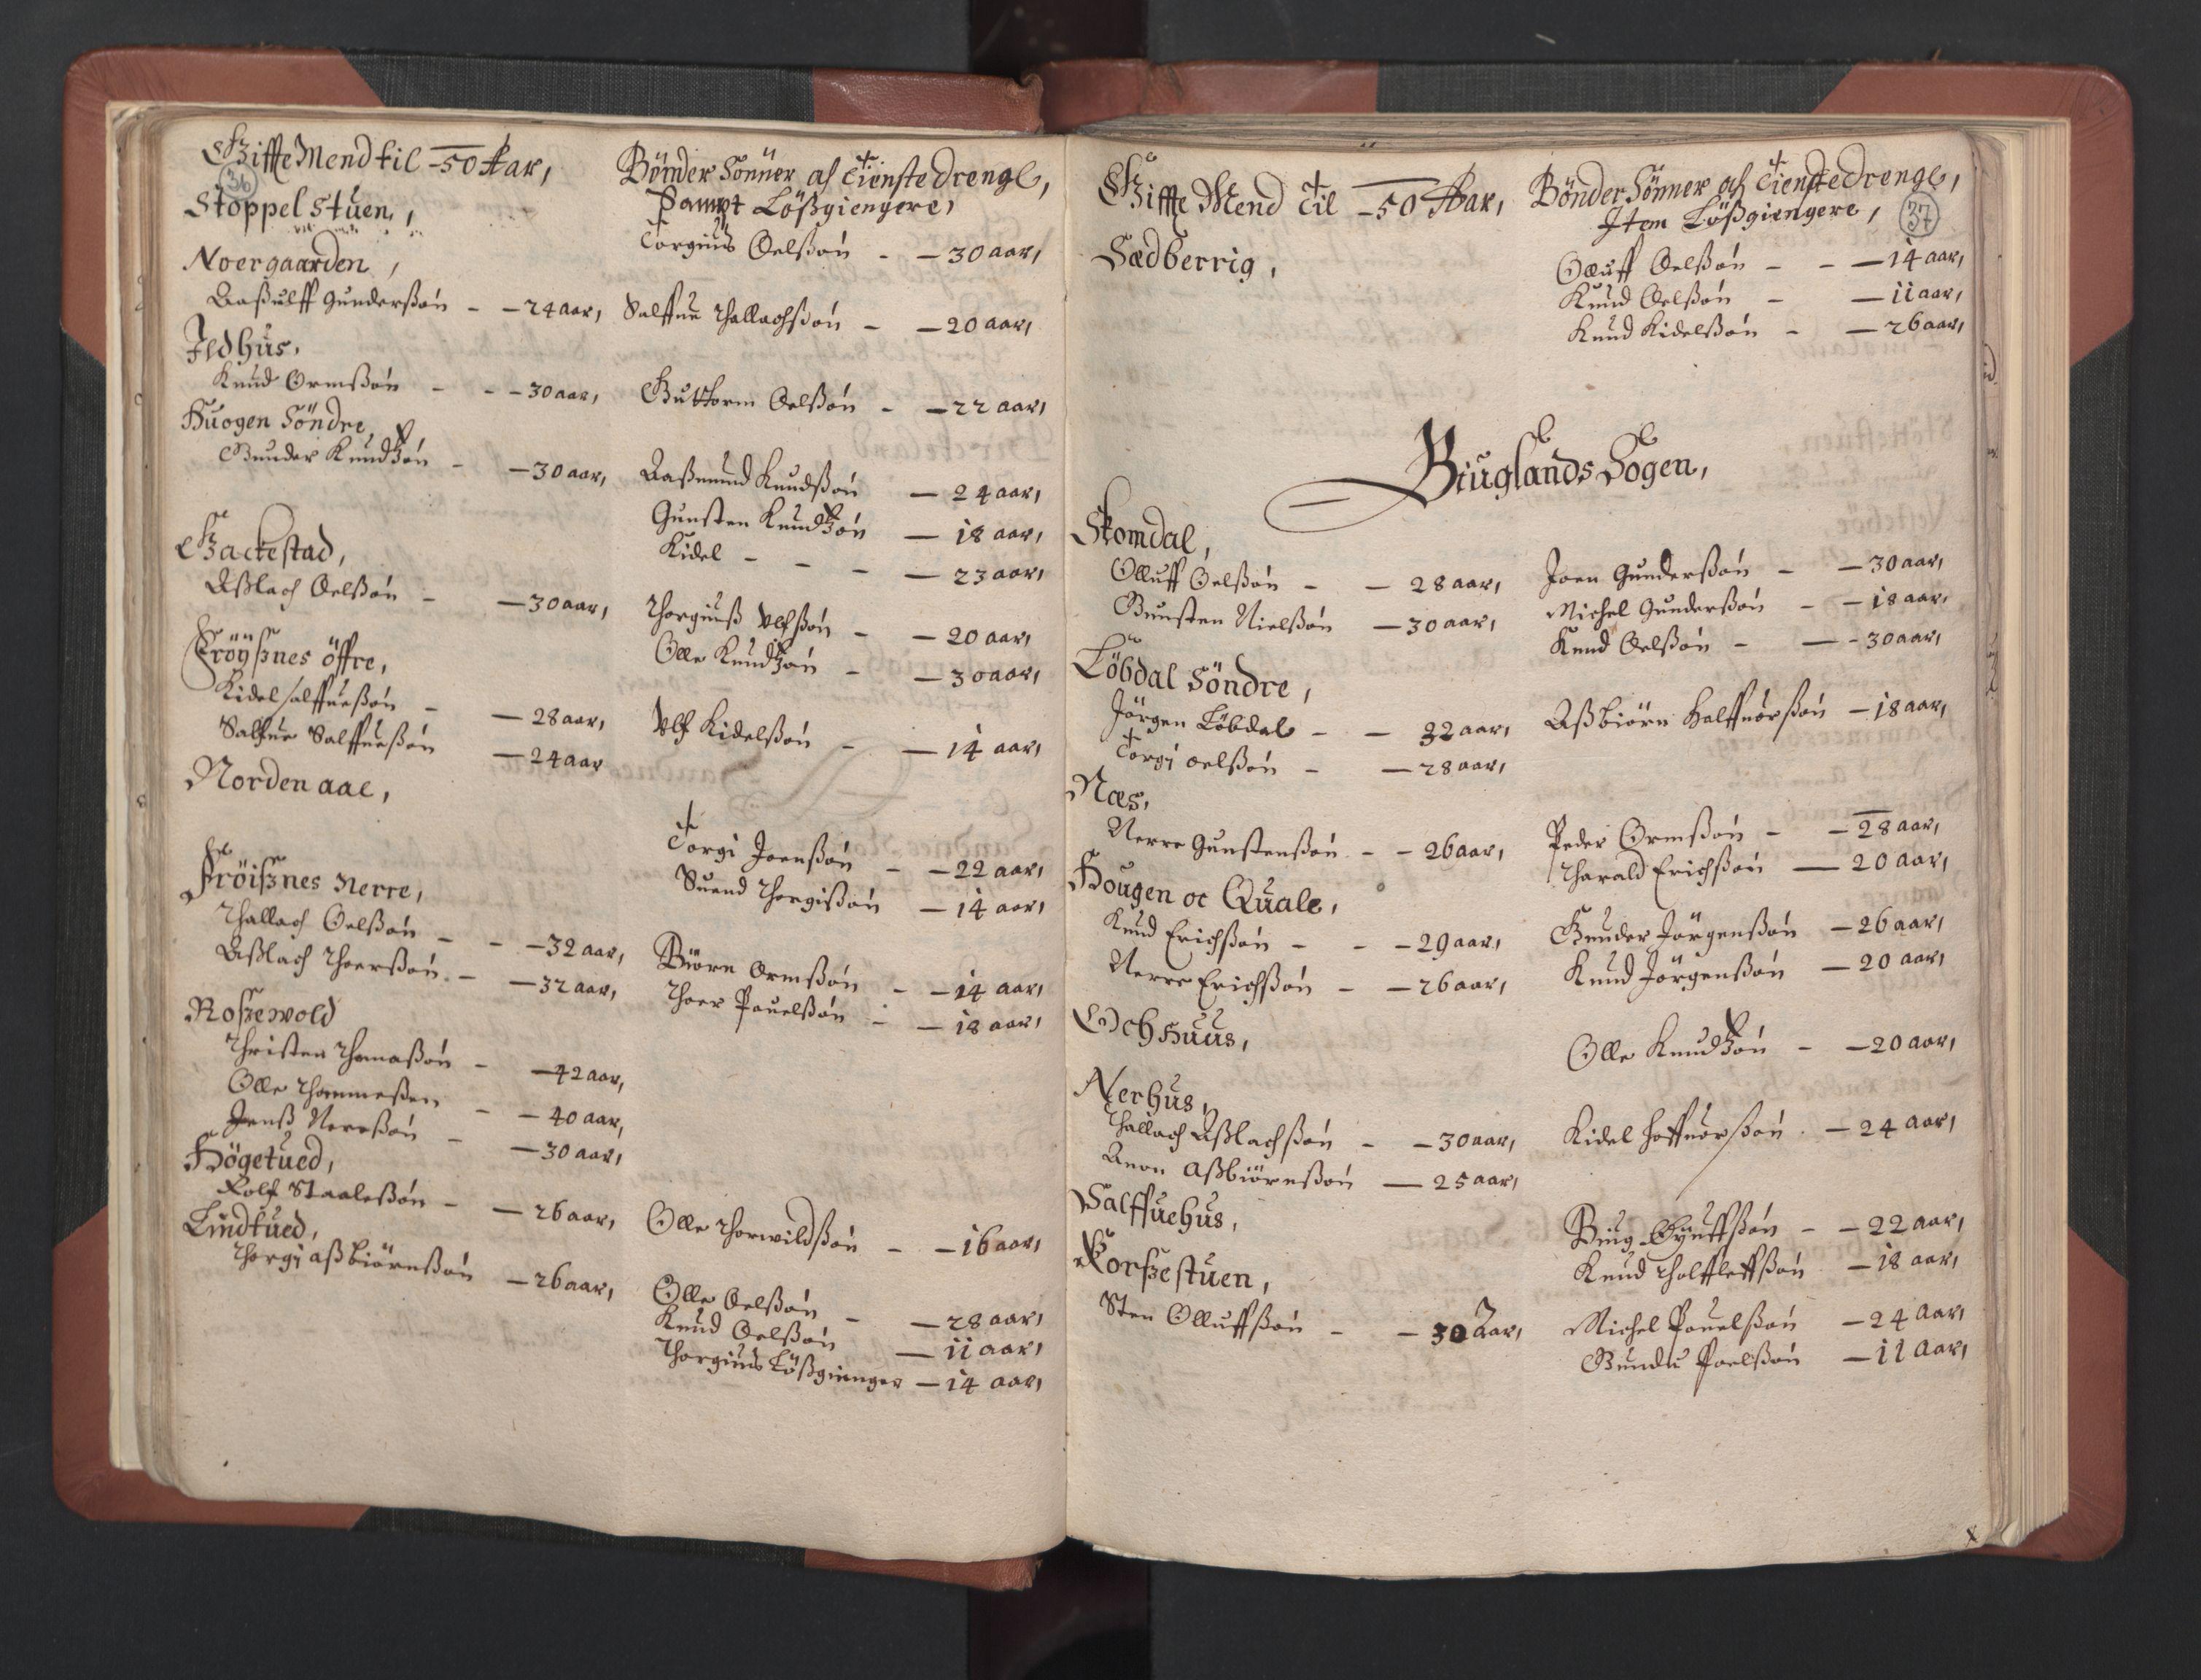 RA, Fogdenes og sorenskrivernes manntall 1664-1666, nr. 8: Råbyggelaget fogderi, 1664-1665, s. 36-37